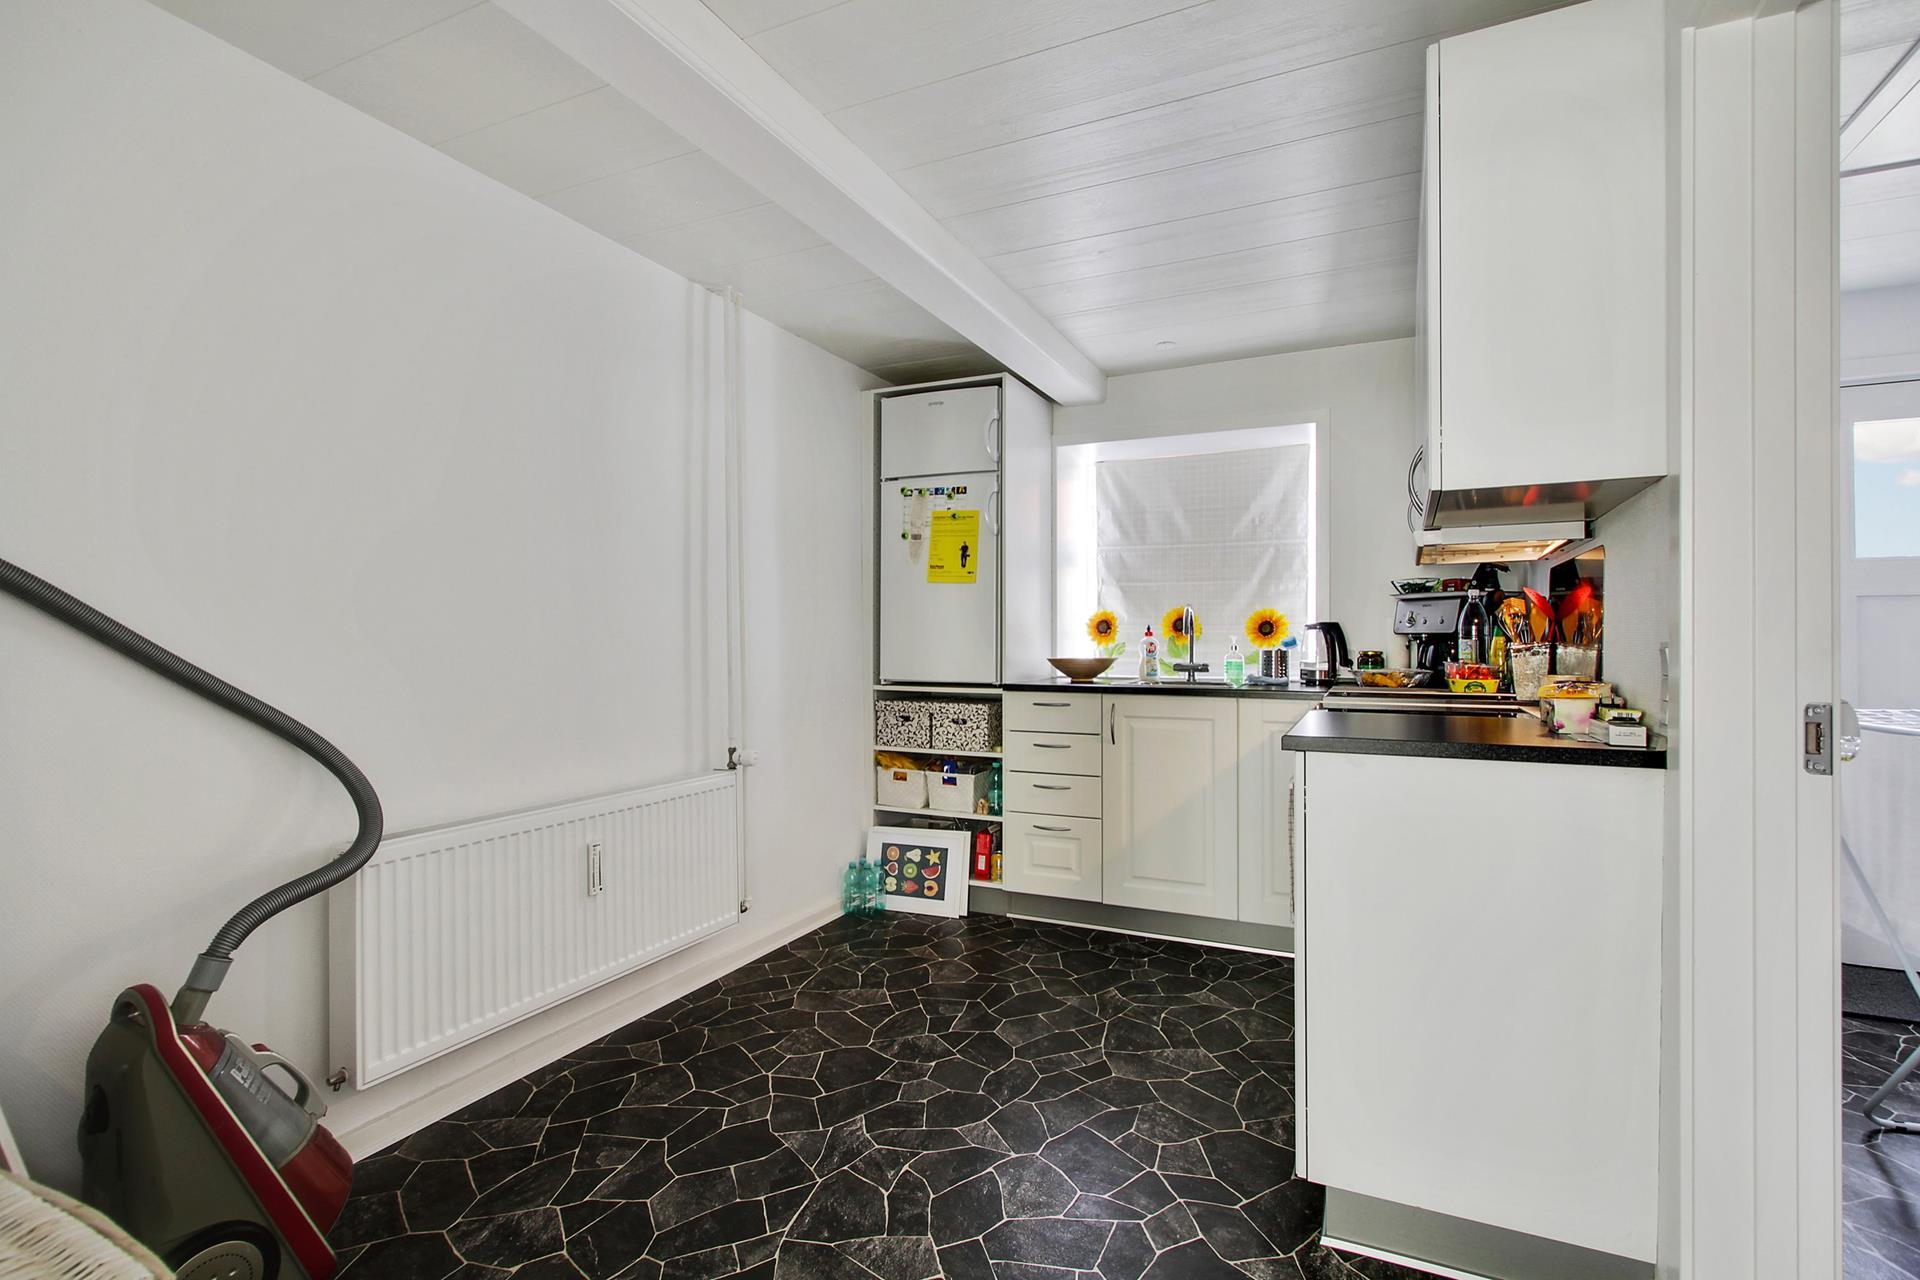 Boligudlejning på Søndergade i Løgumkloster - Køkken